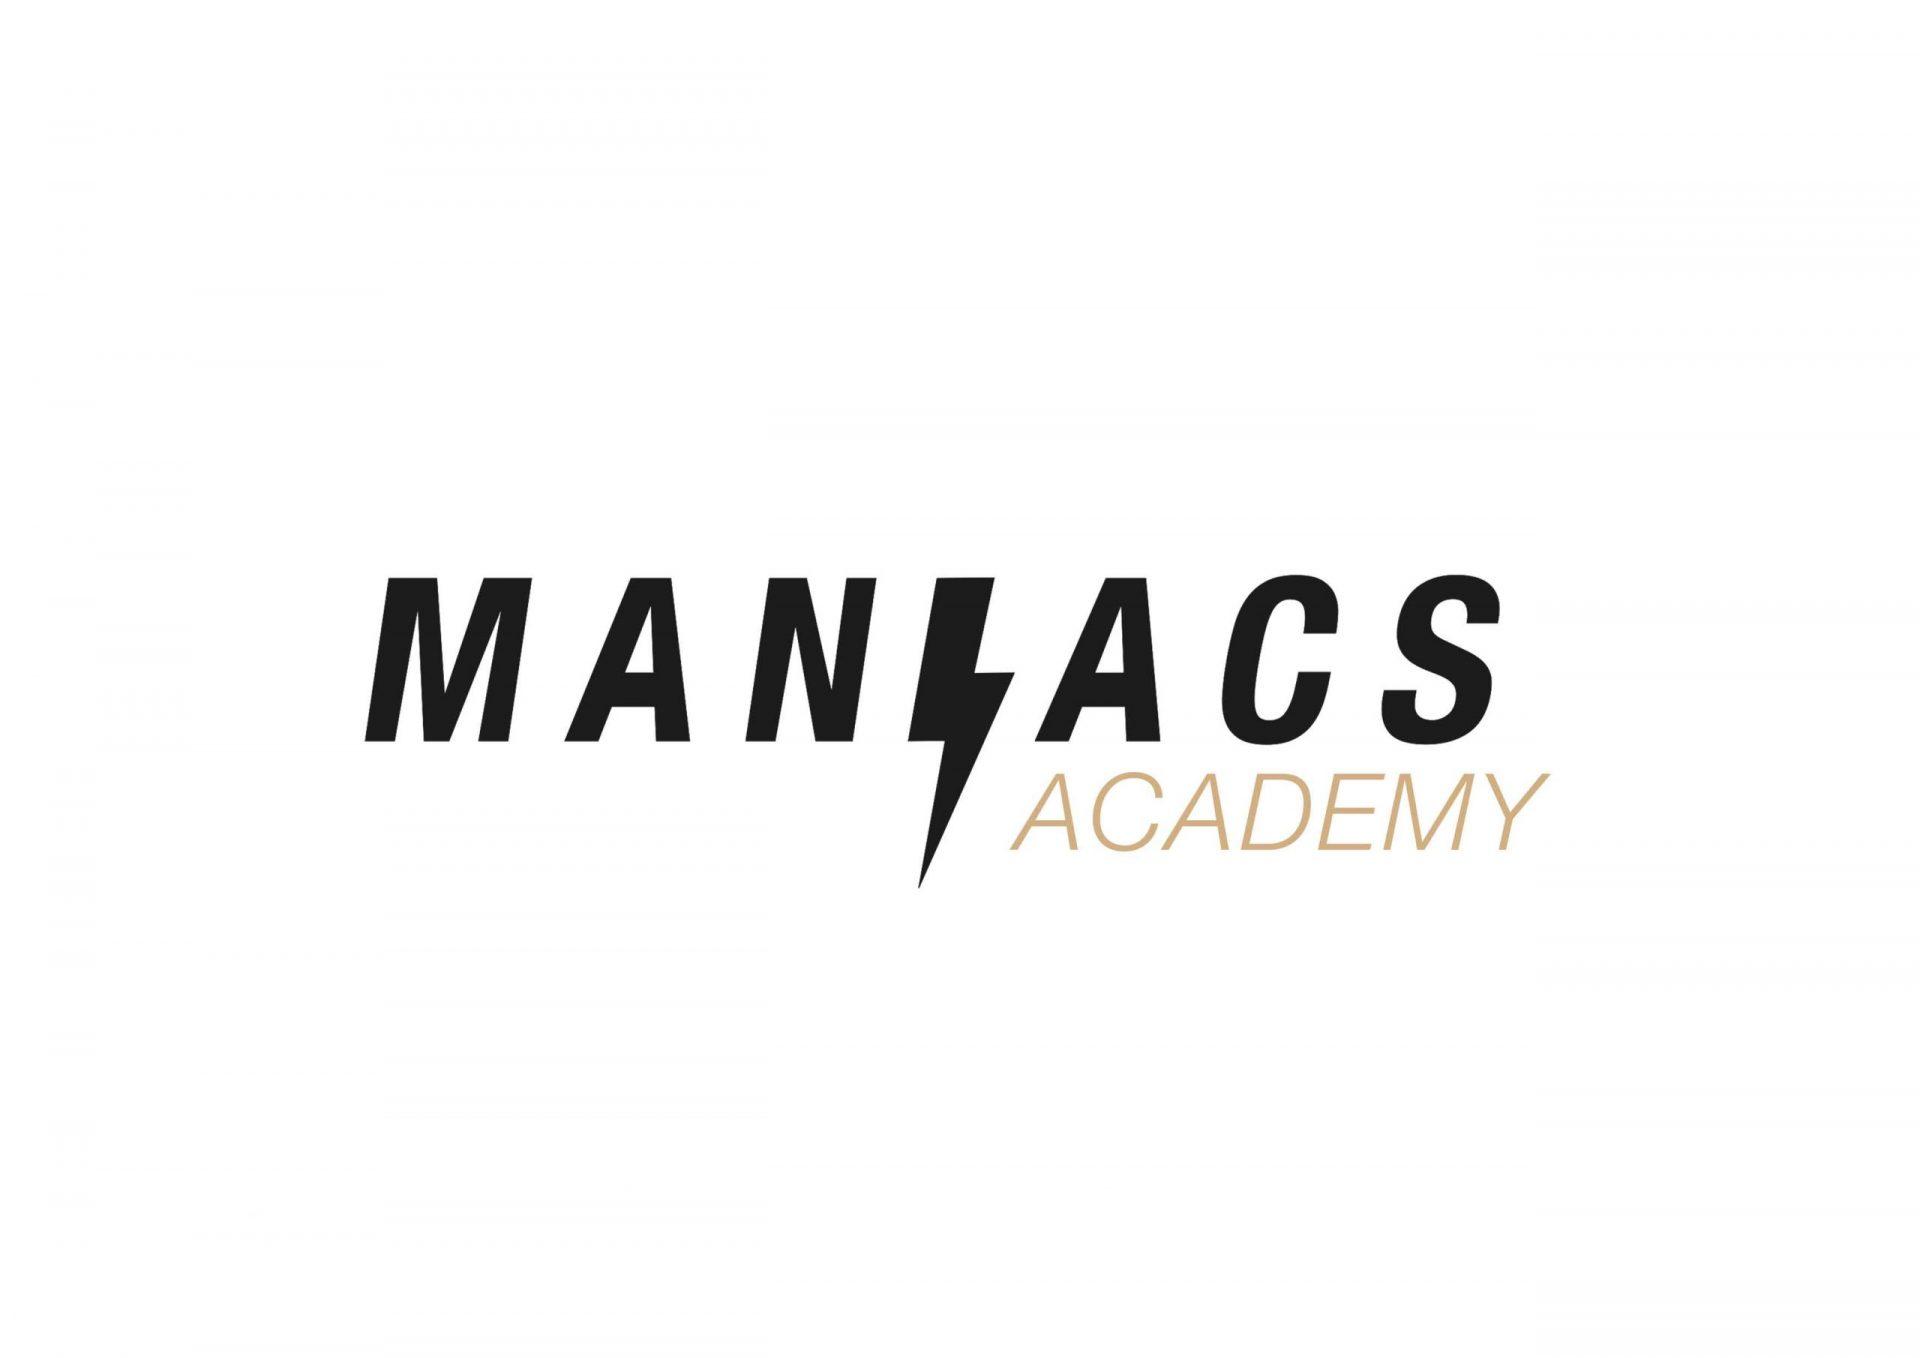 MANIACS_Academy